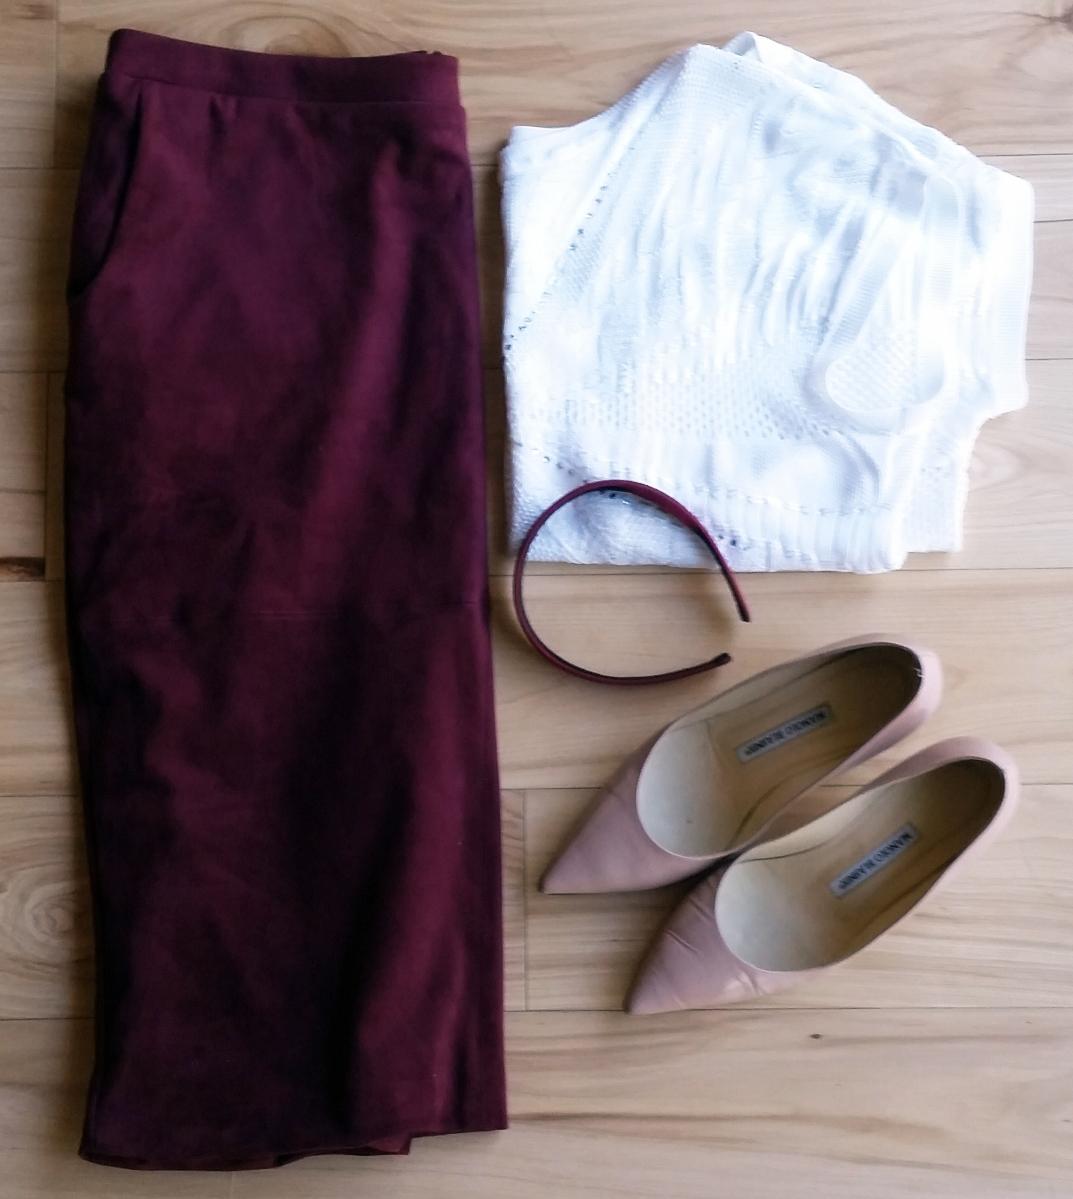 Maroon skirt, white top, beige shoes, maroon headband